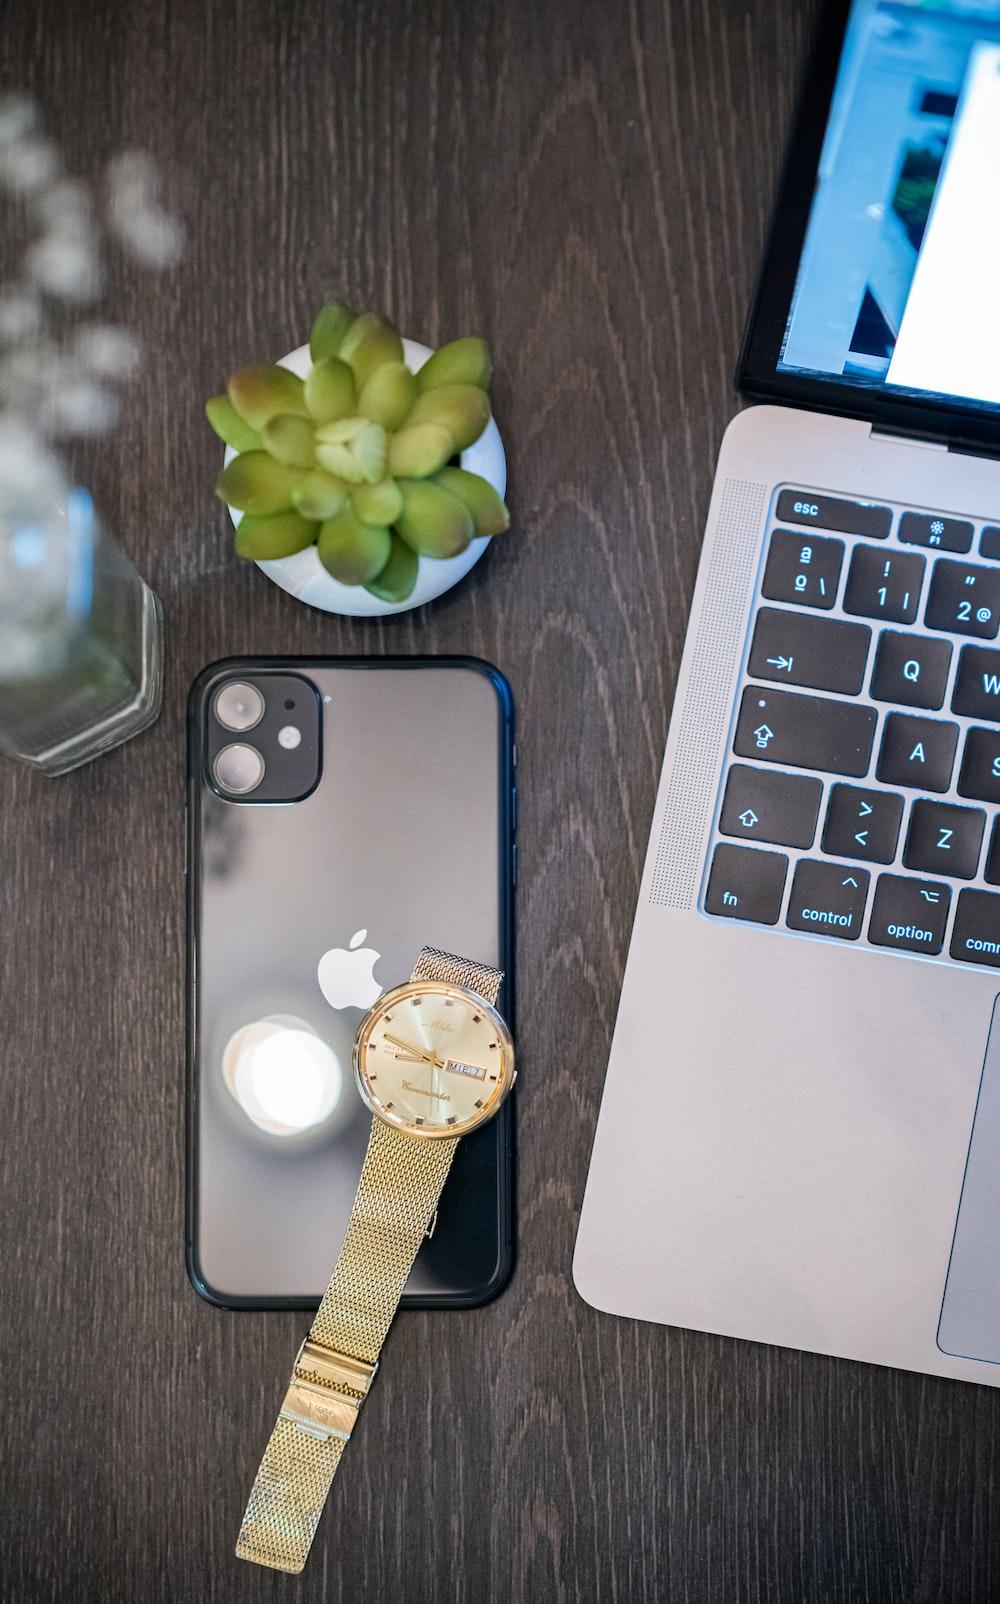 silver iphone 6 beside macbook pro